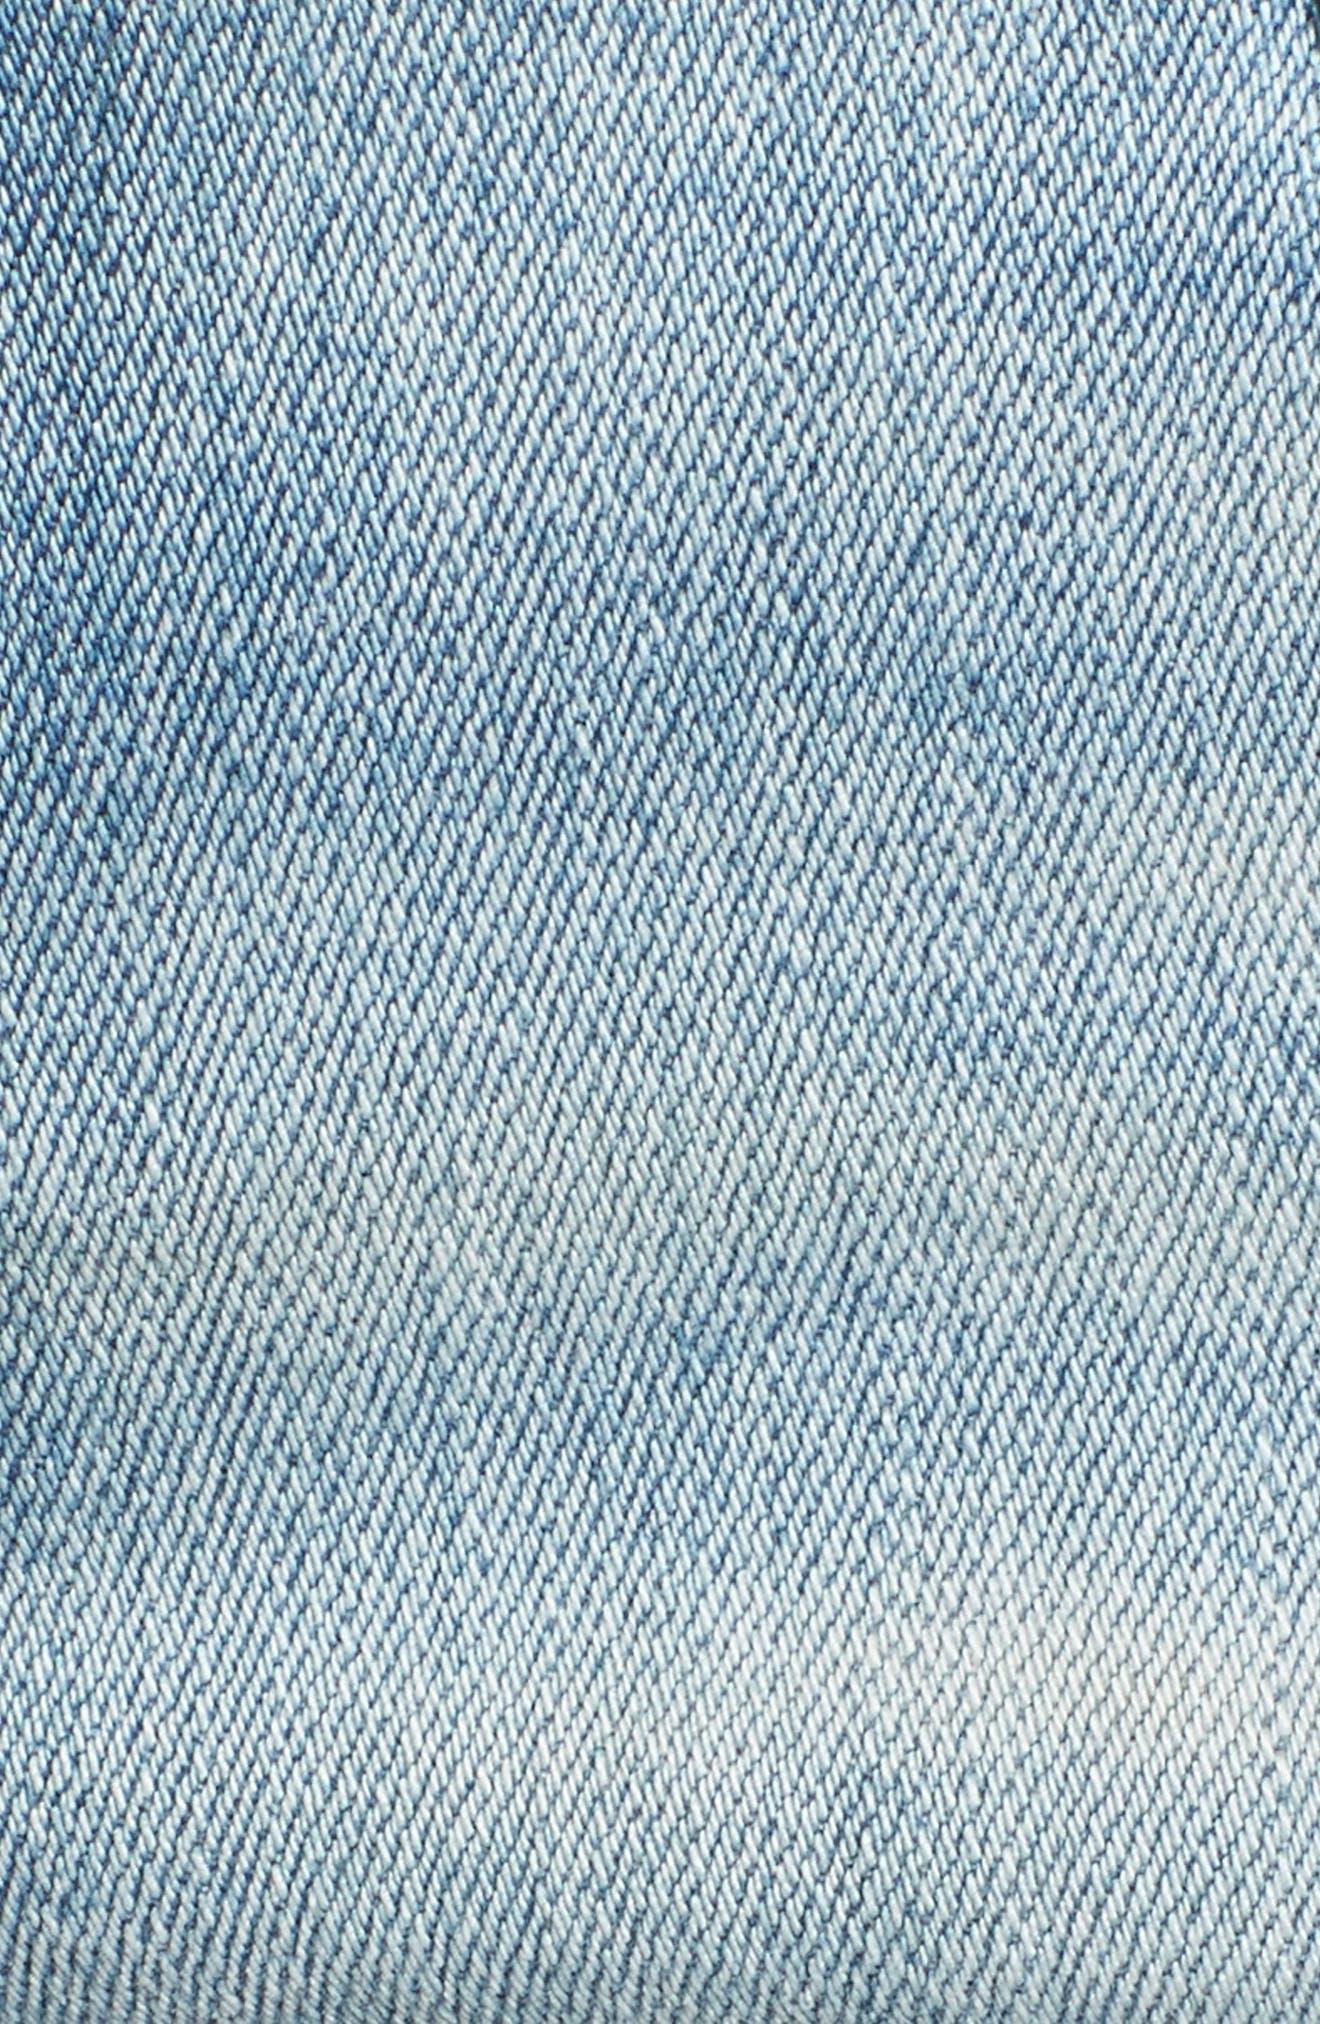 Joey Cutoff Denim Shorts,                             Alternate thumbnail 5, color,                             Cloud Nine